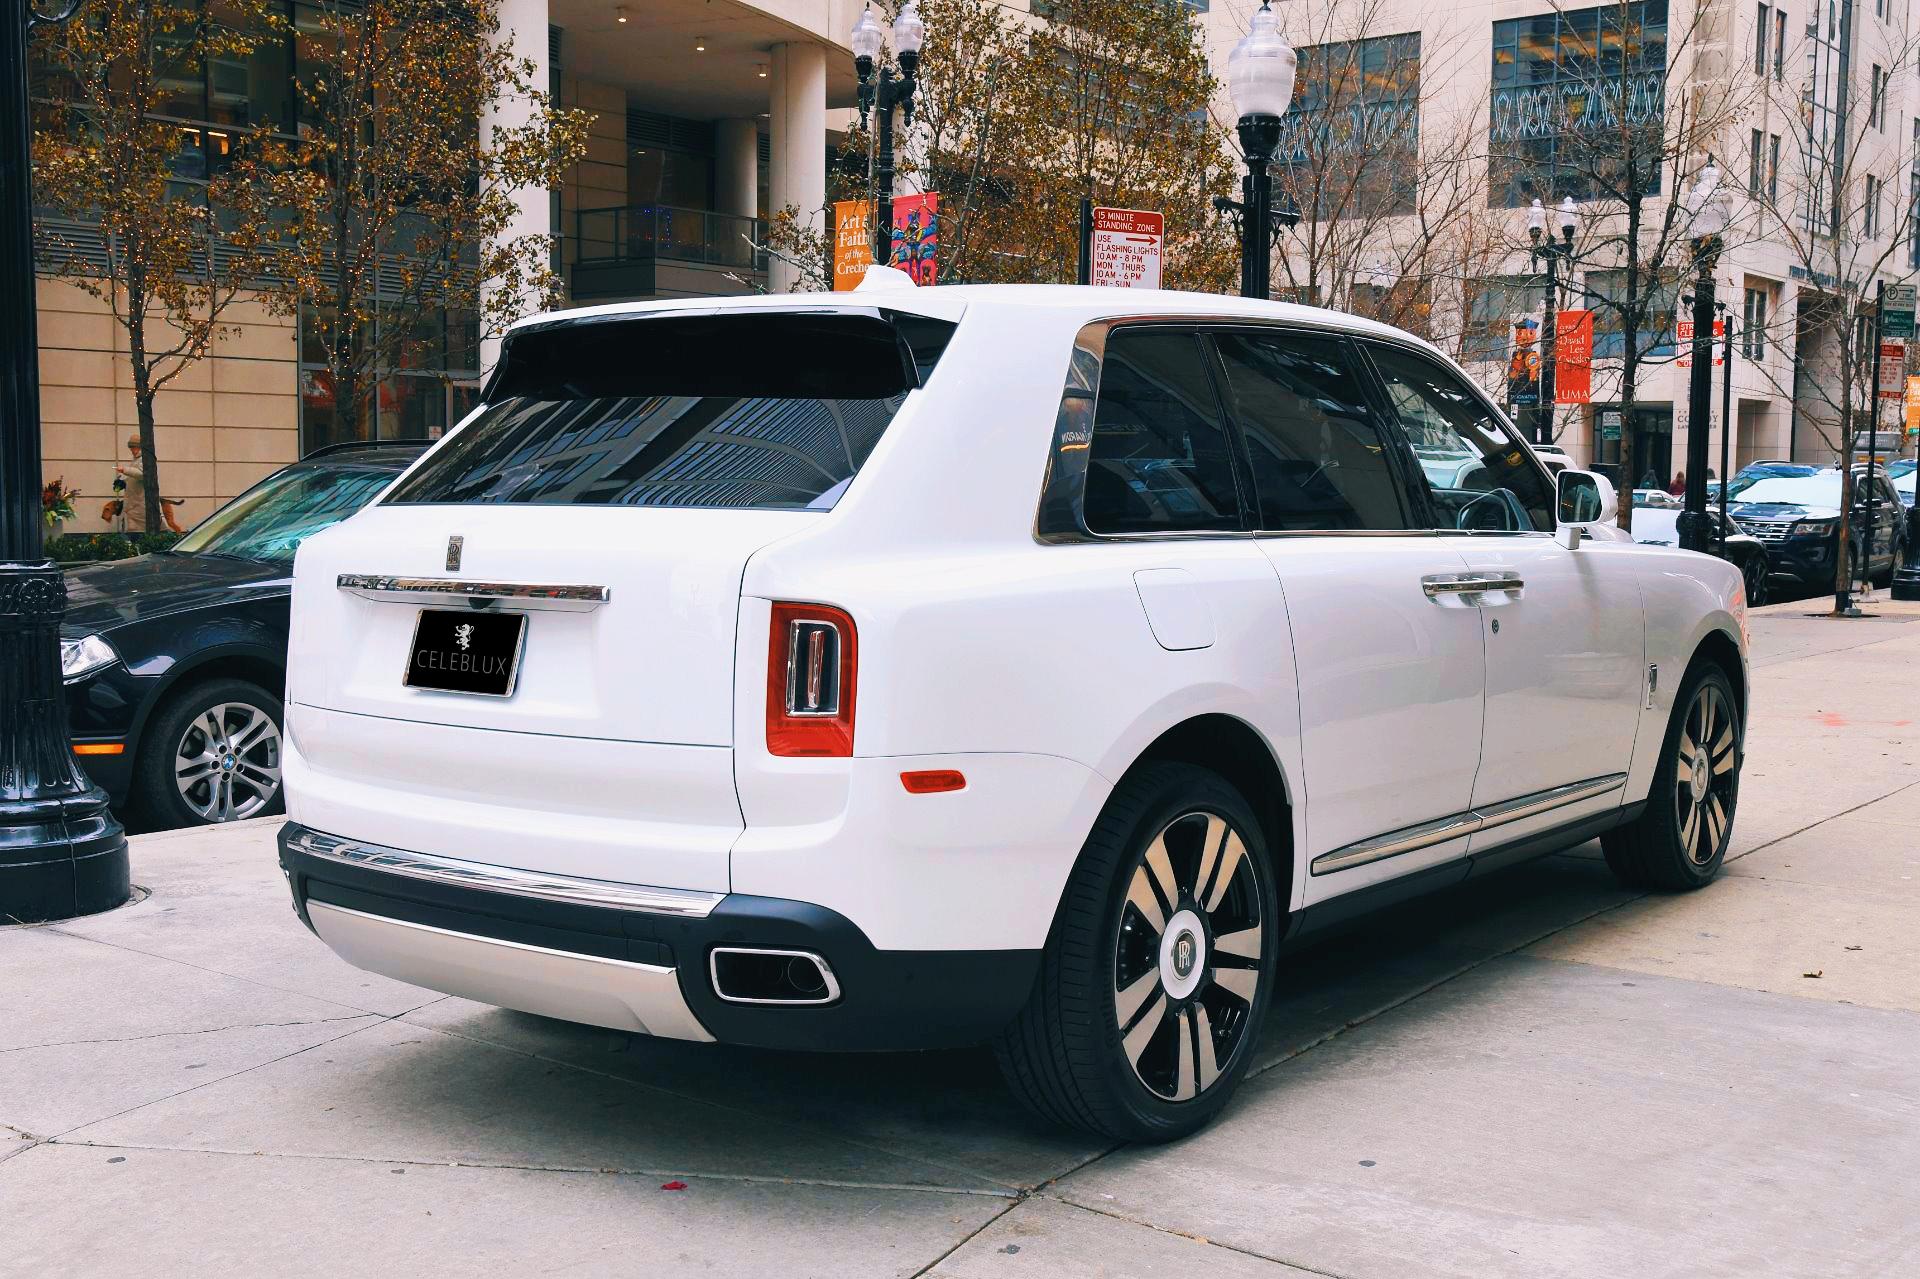 Rent A Chauffeured Rolls Royce Suv Prom Car Celeblux